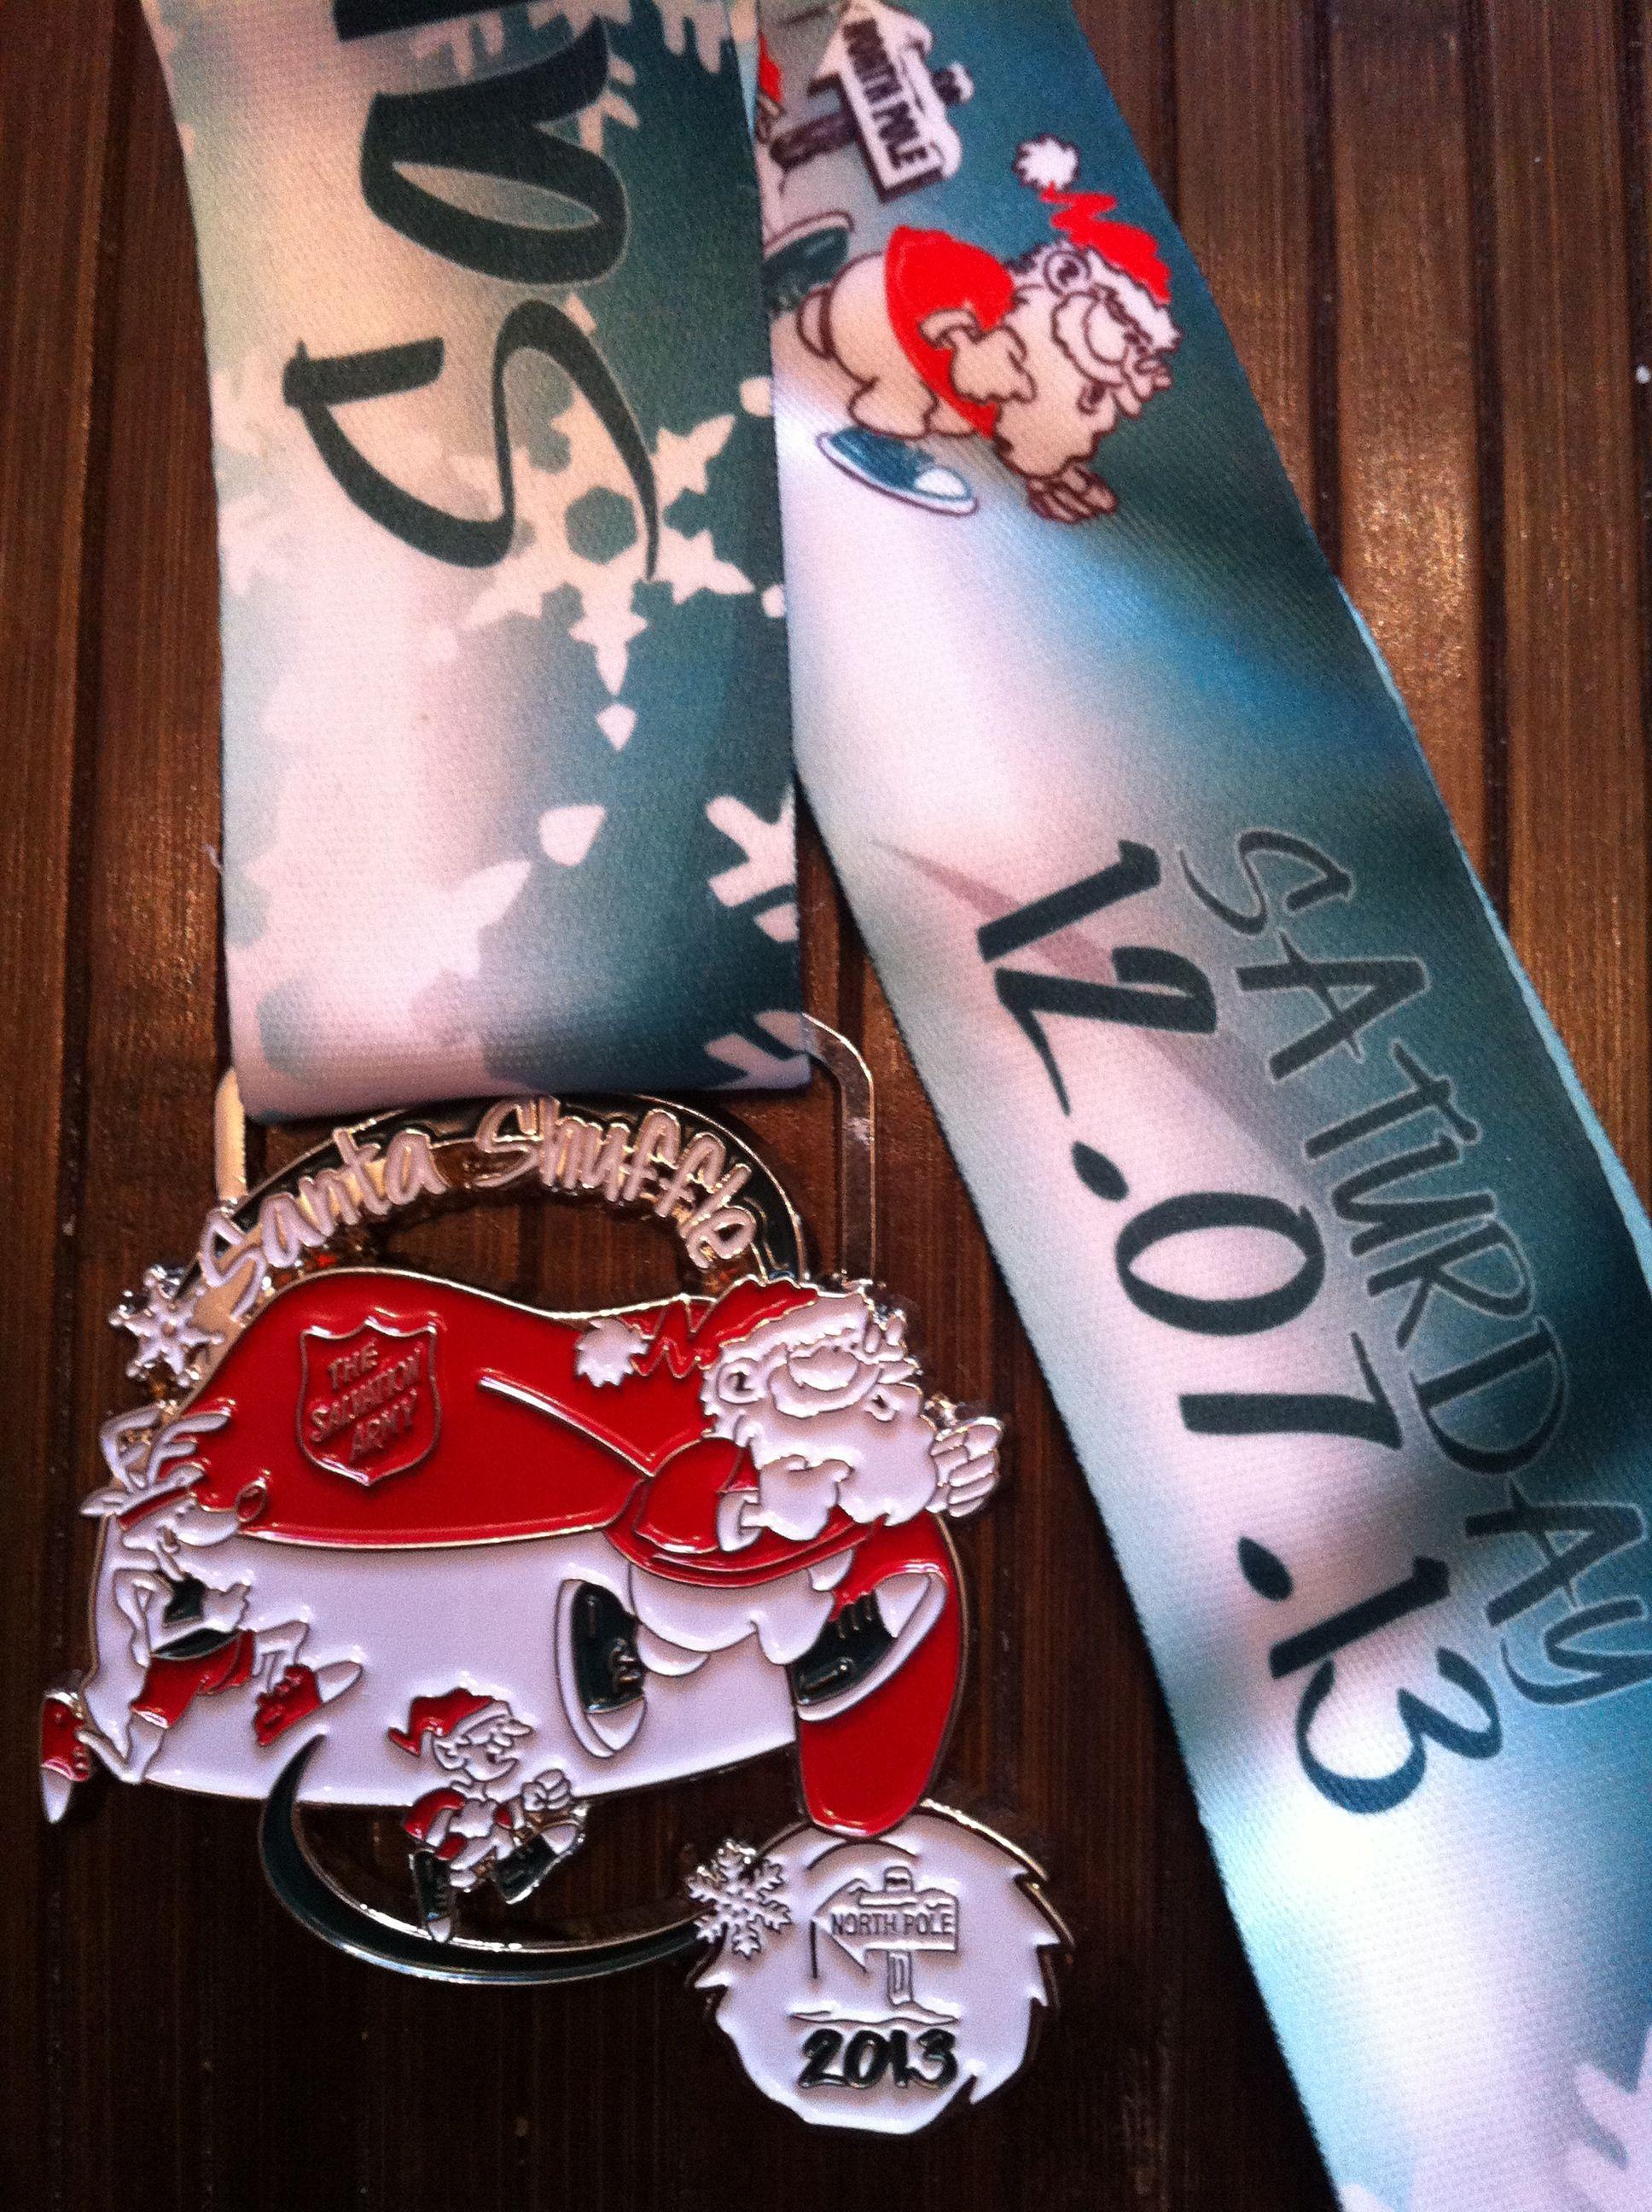 Santa Shuffle 2013 Race medal, Water bottle, Voss bottle